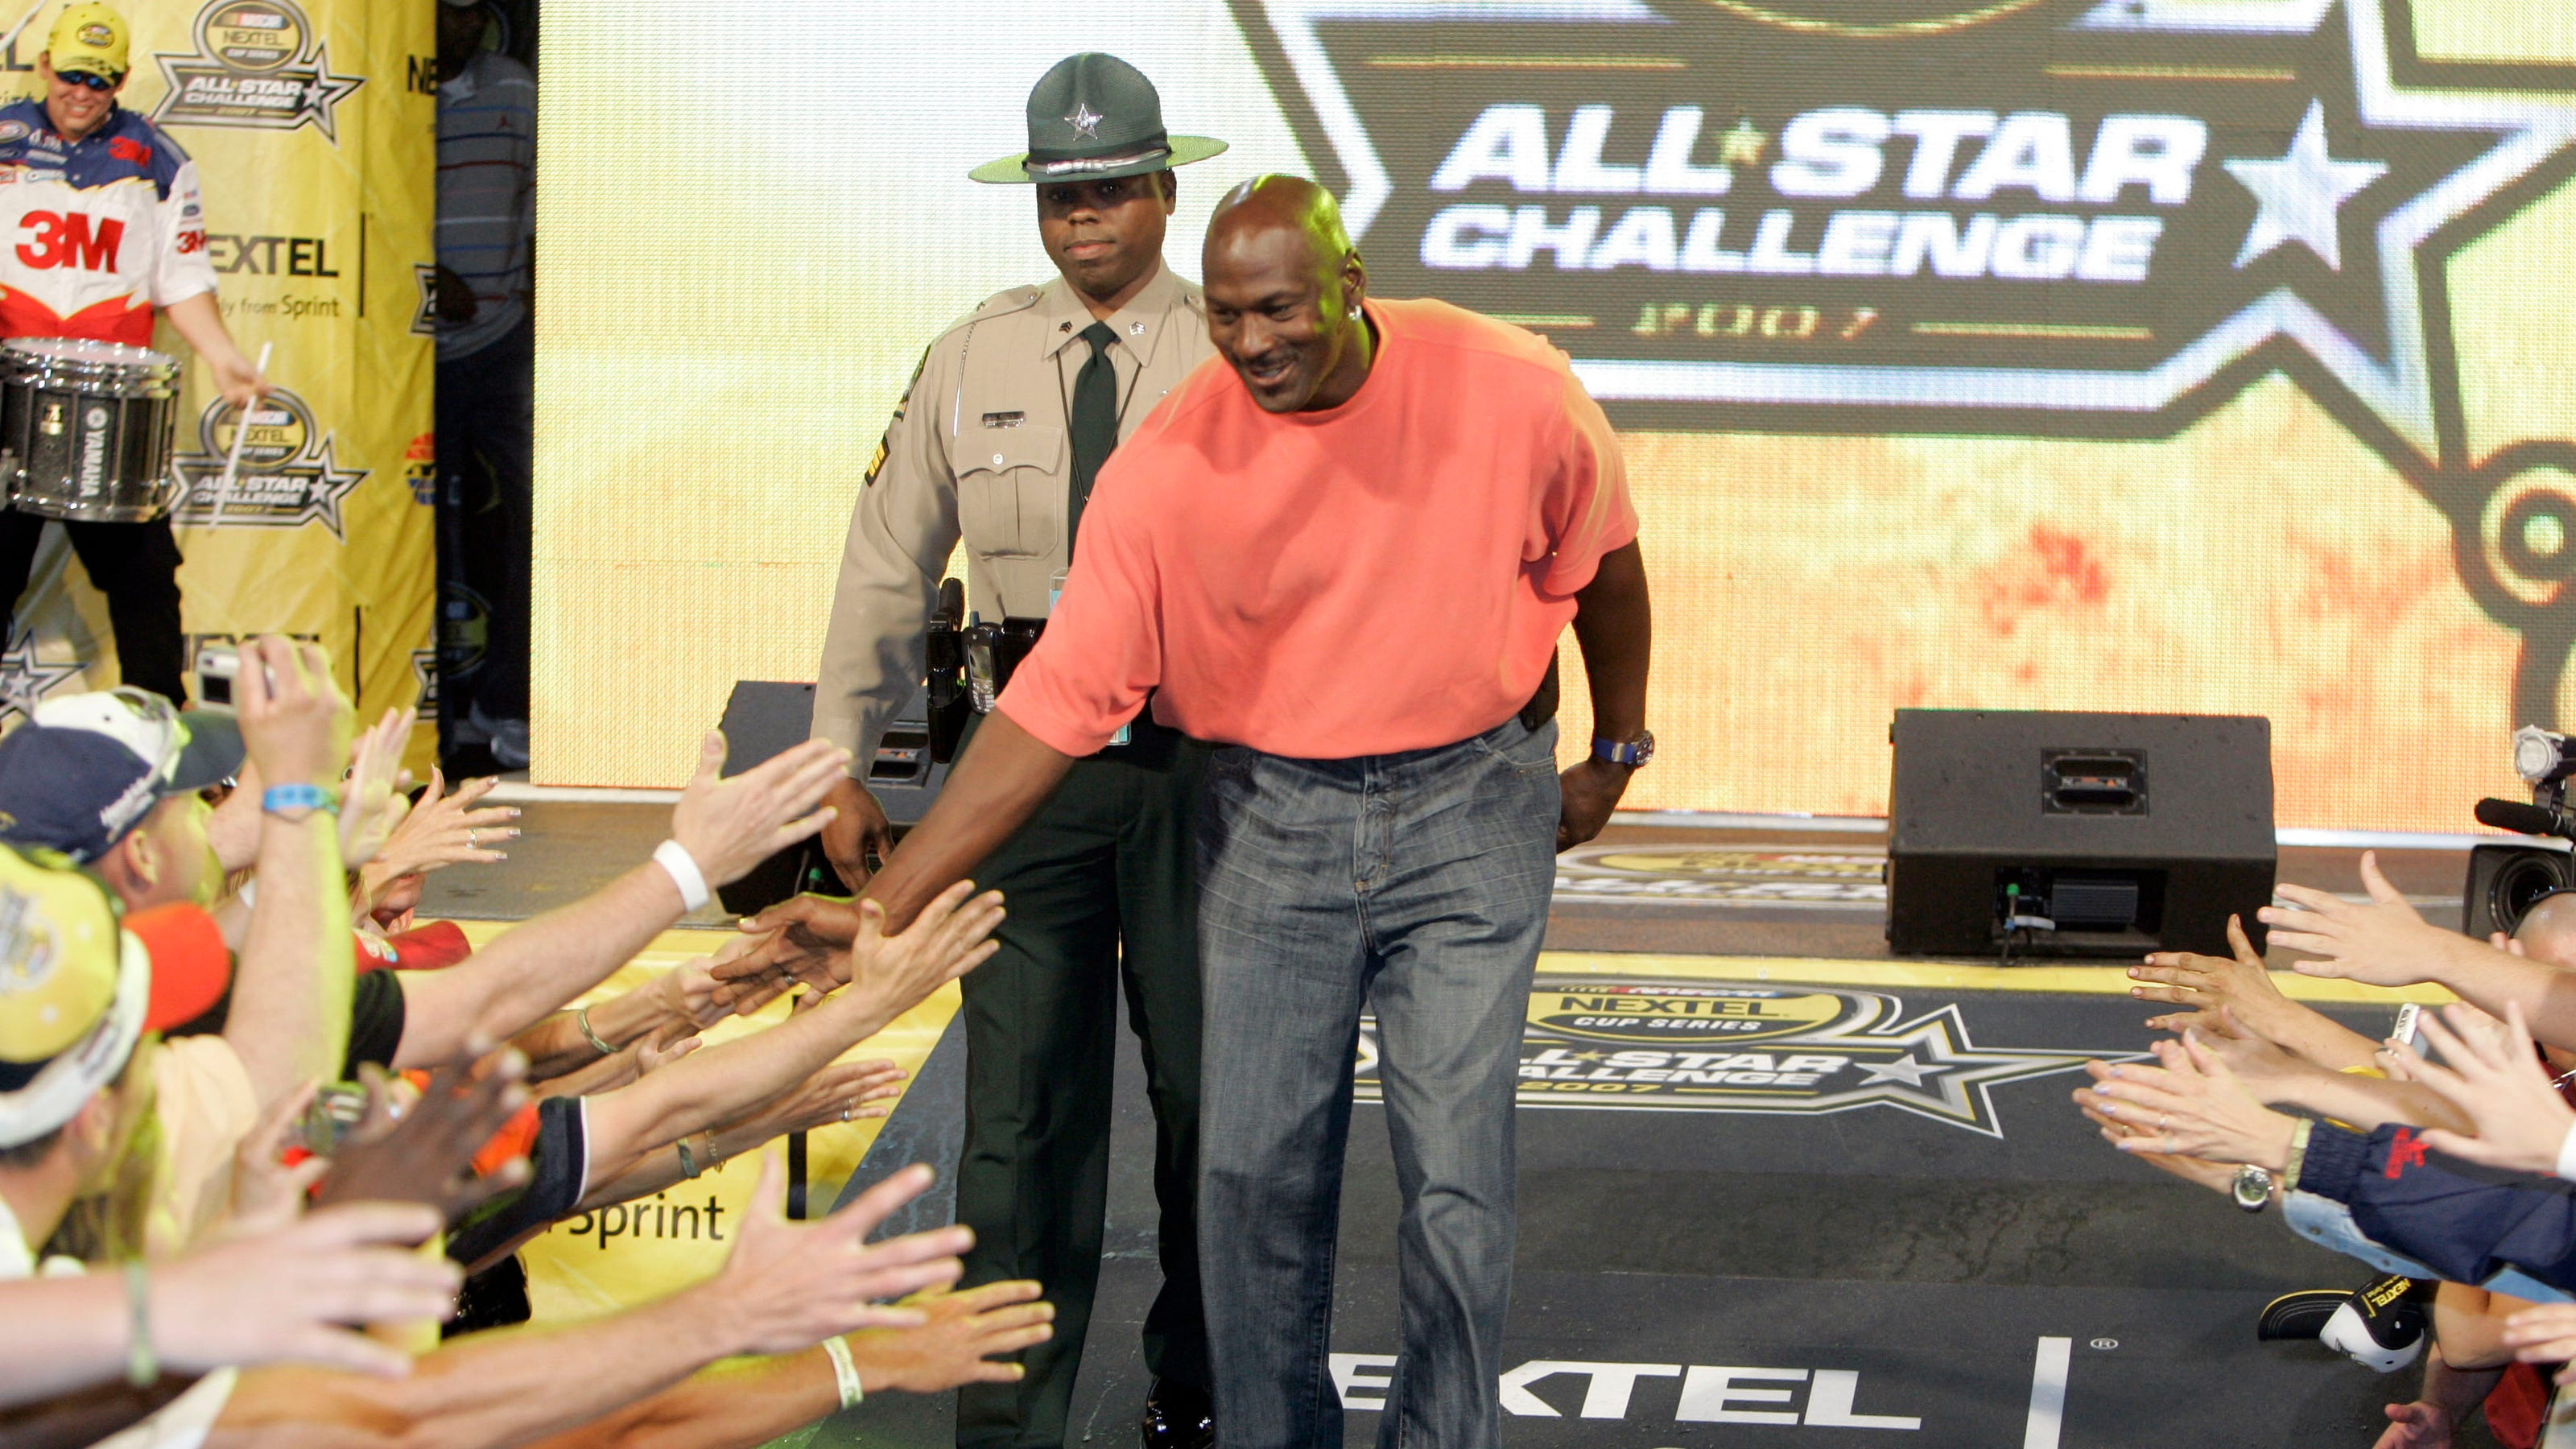 Michael Jordan, Denny Hamlin form new NASCAR team, hire Bubba Wallace as driver